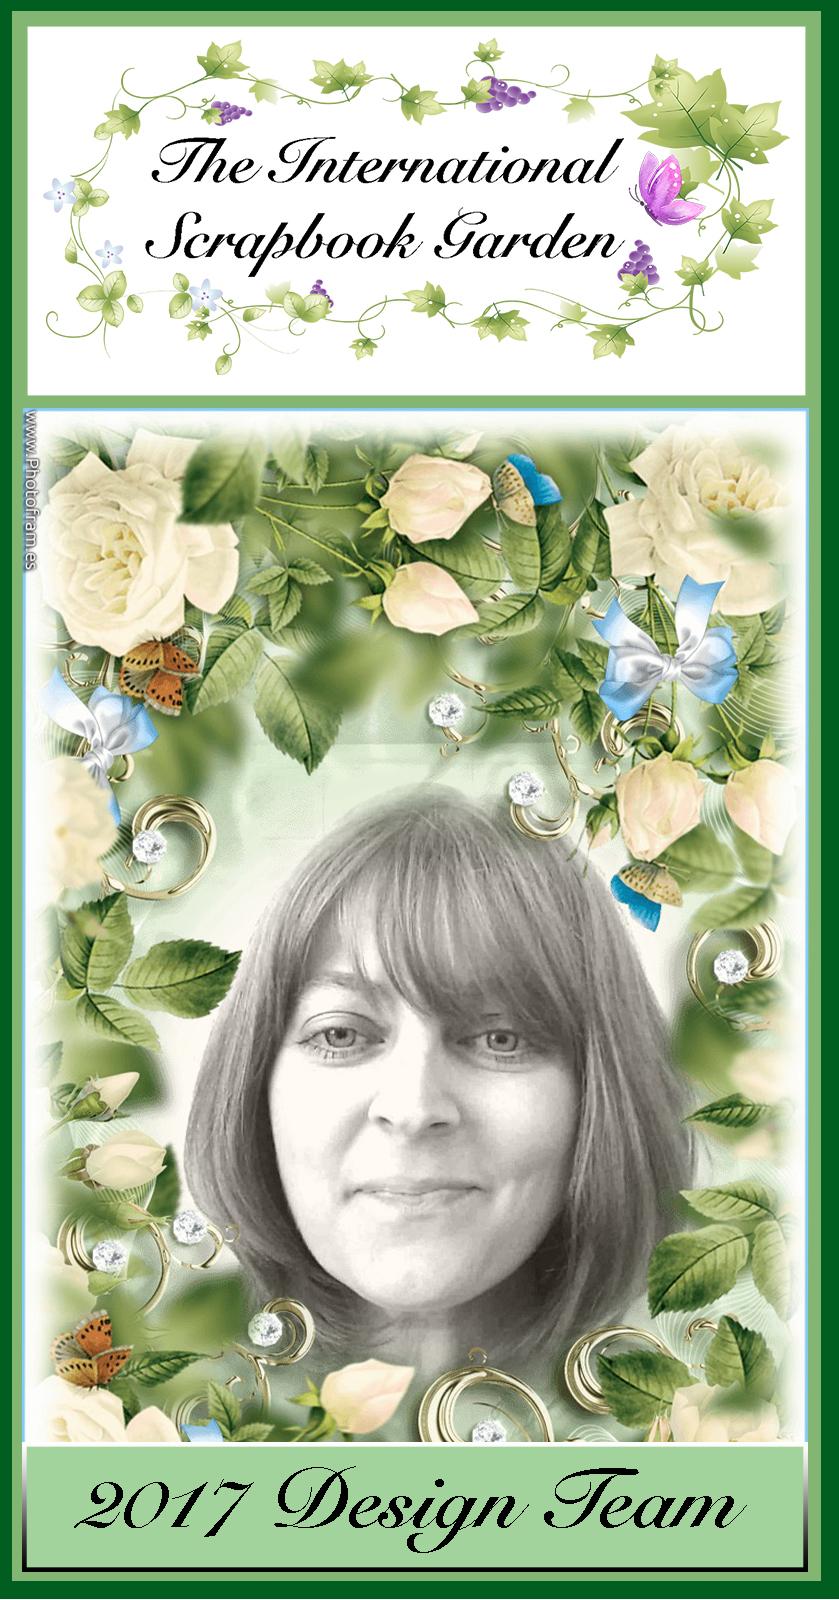 LaurieLeahey.jpg